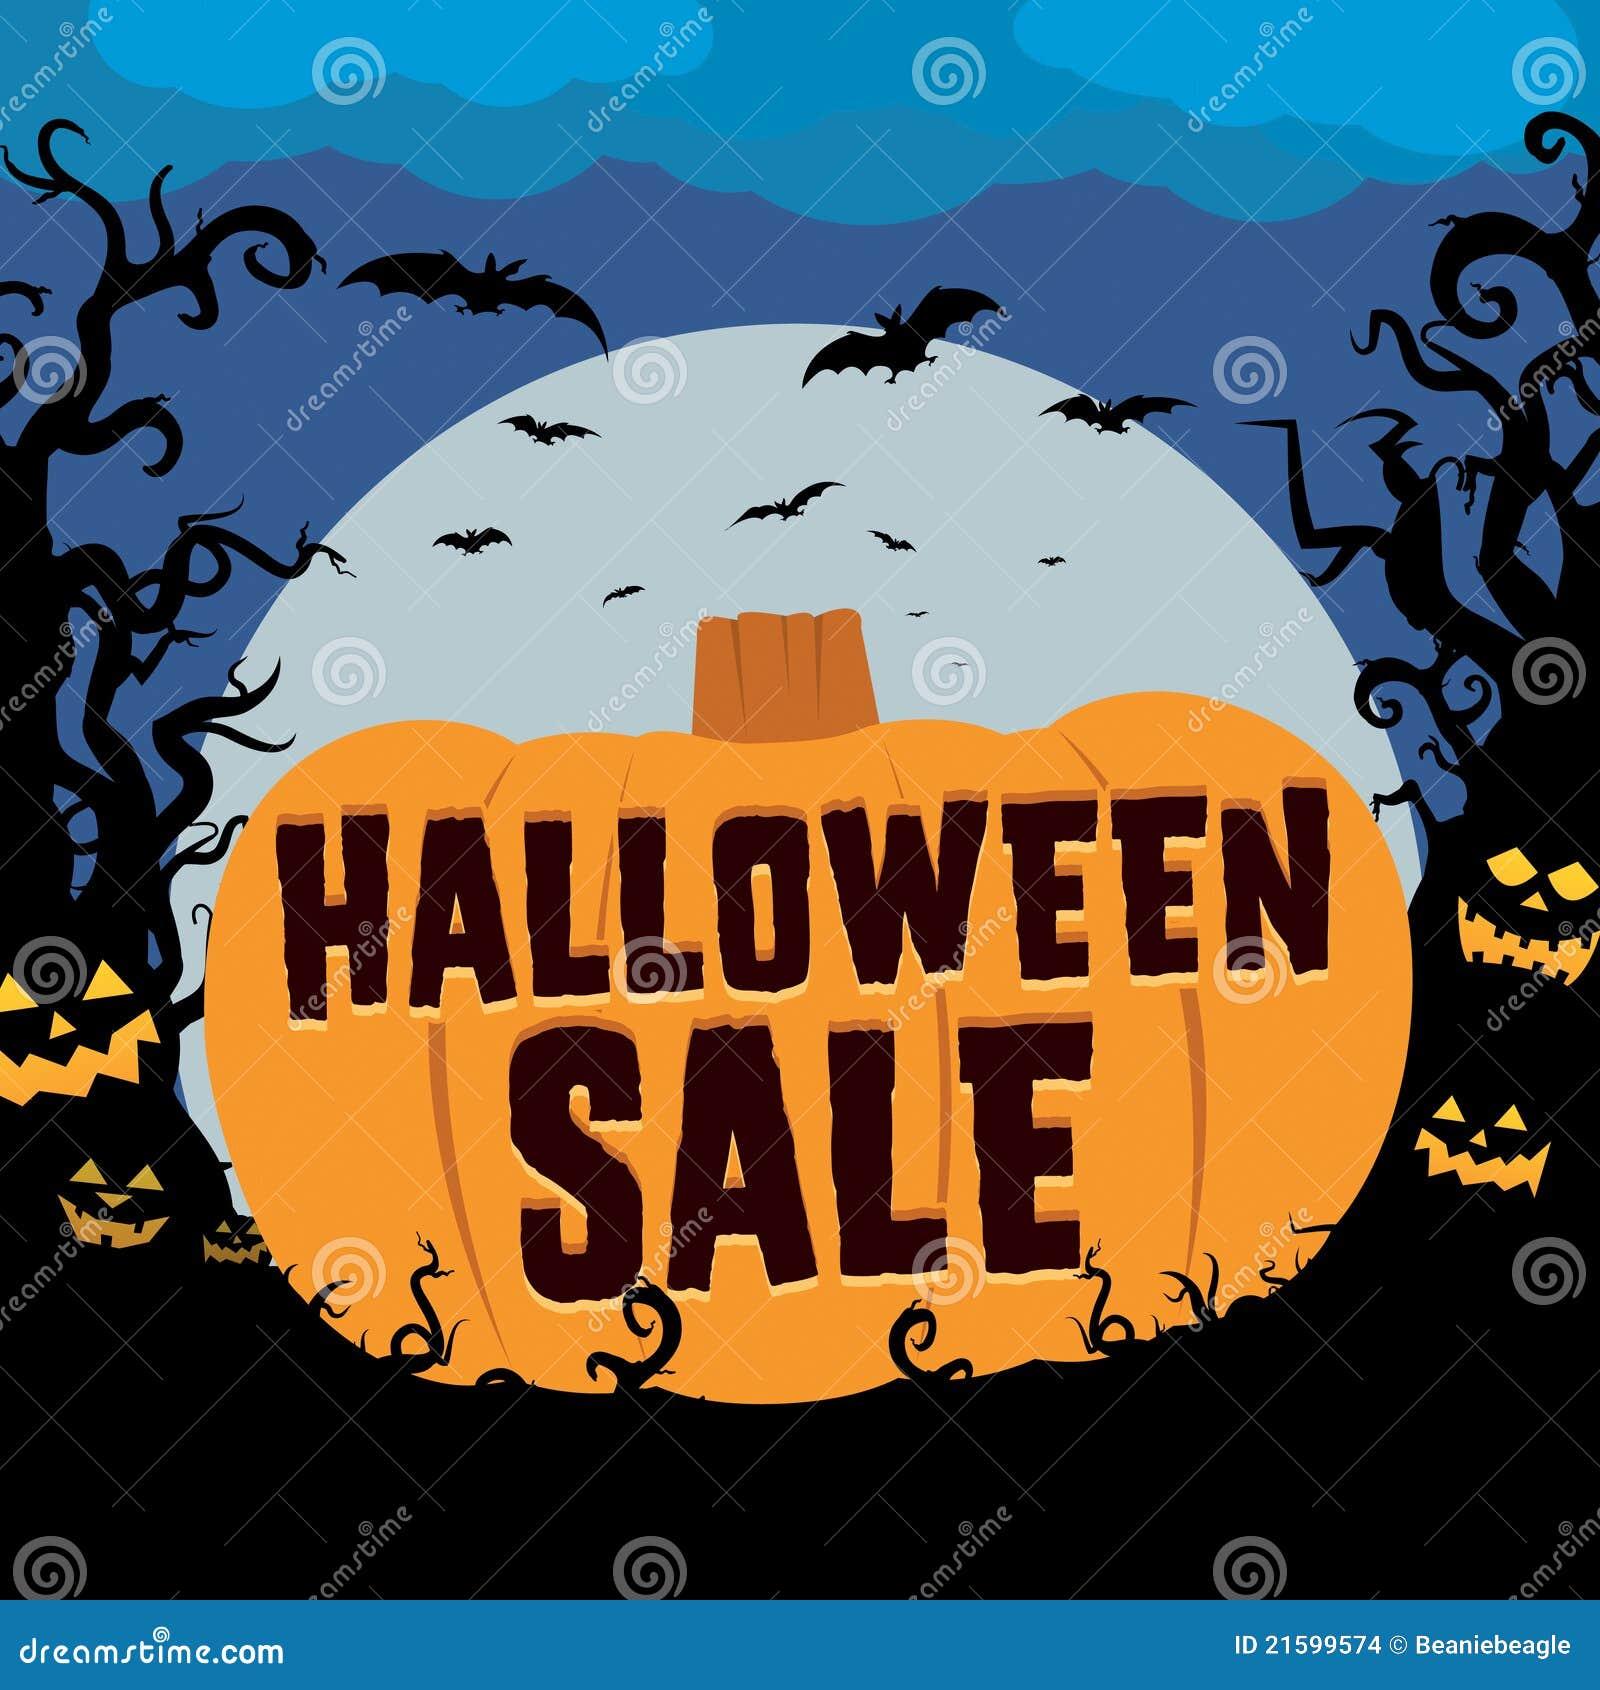 Halloween Sale stock vector. Illustration of sale, seasonal - 21599574